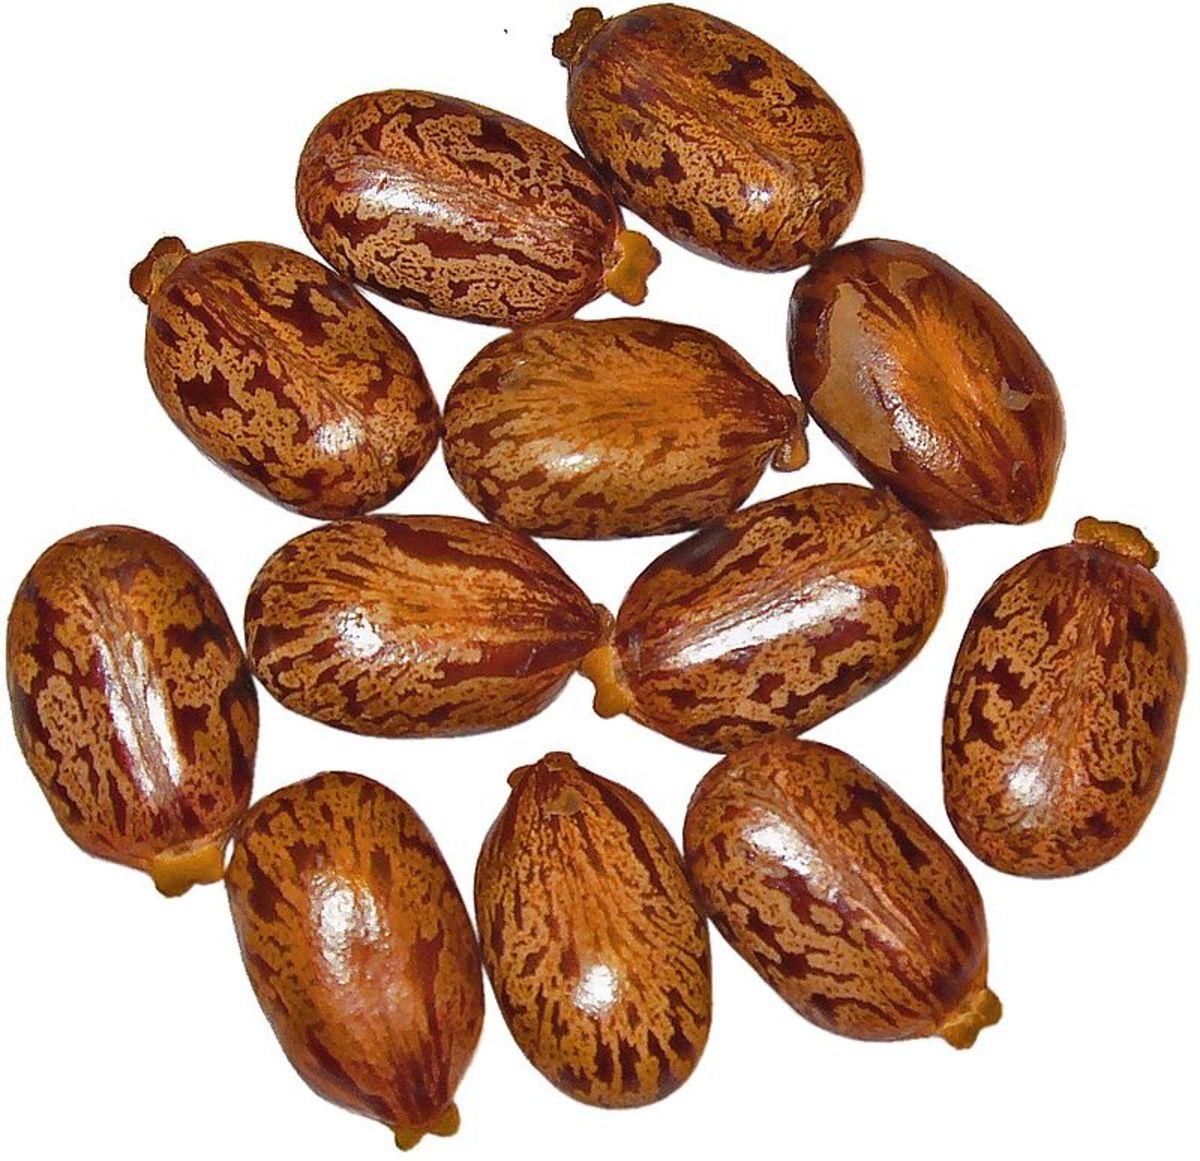 Castor bean seeds look like beans.